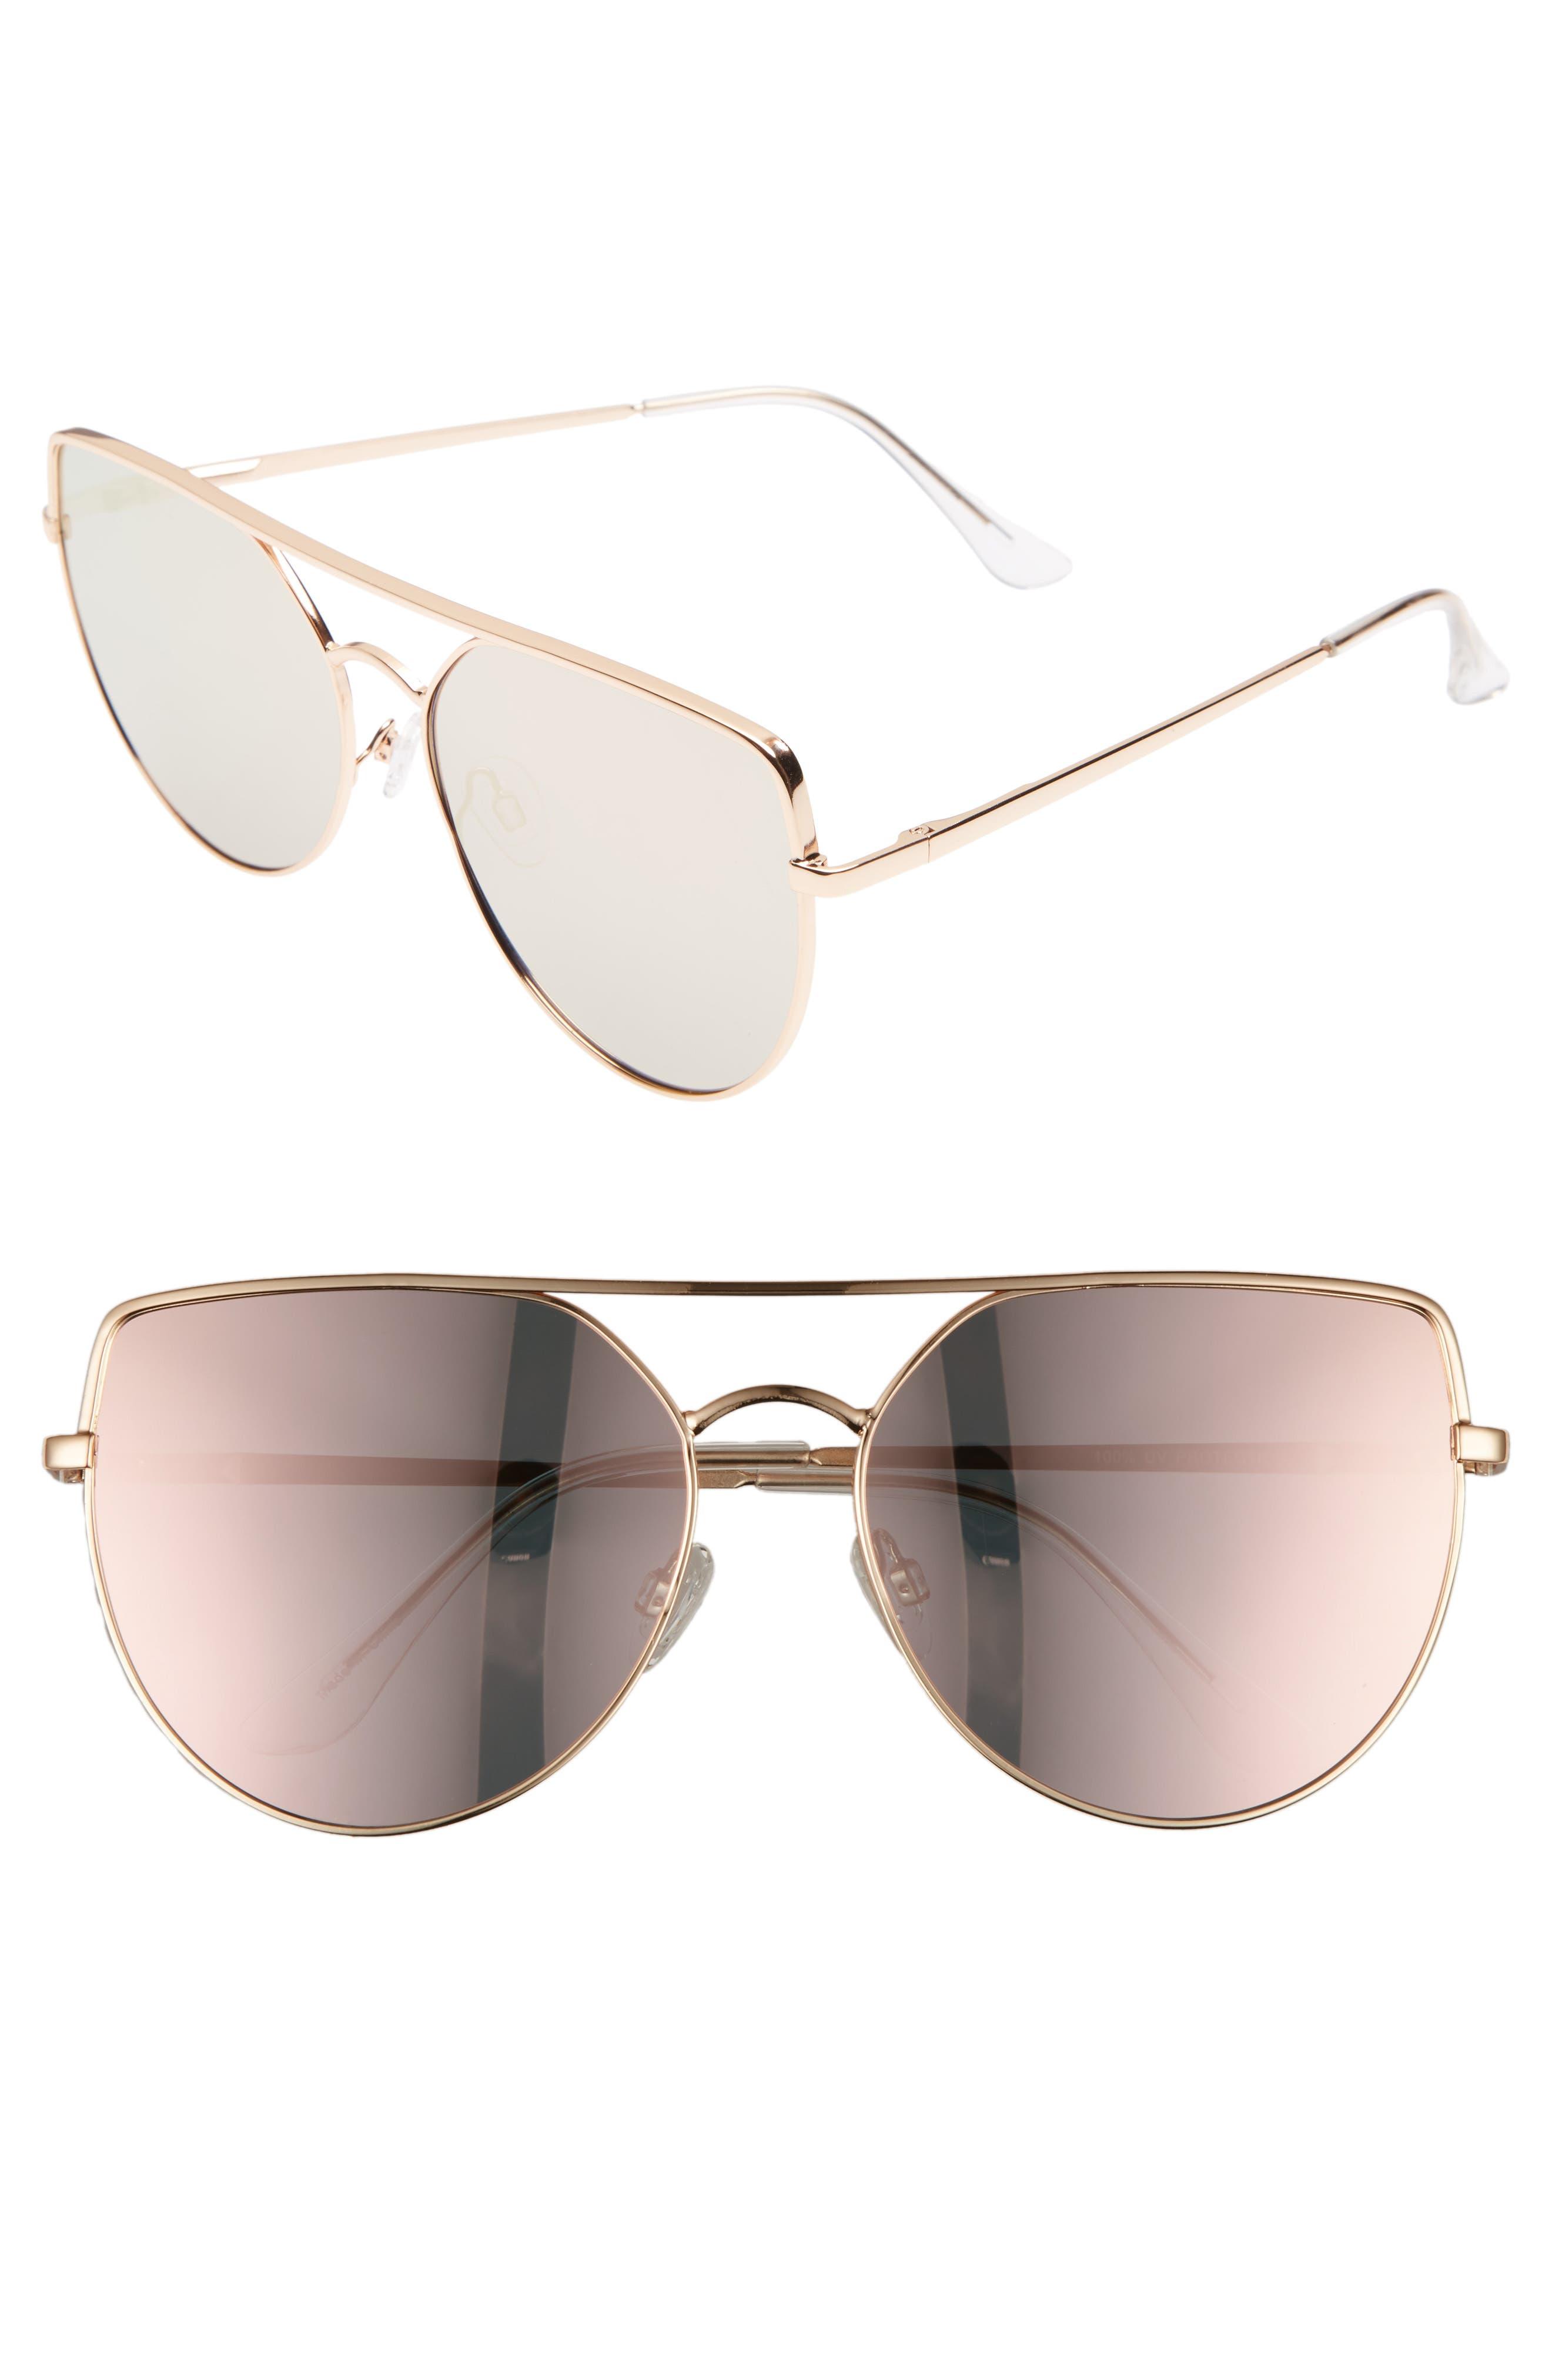 60mm Aviator Sunglasses,                         Main,                         color, 220